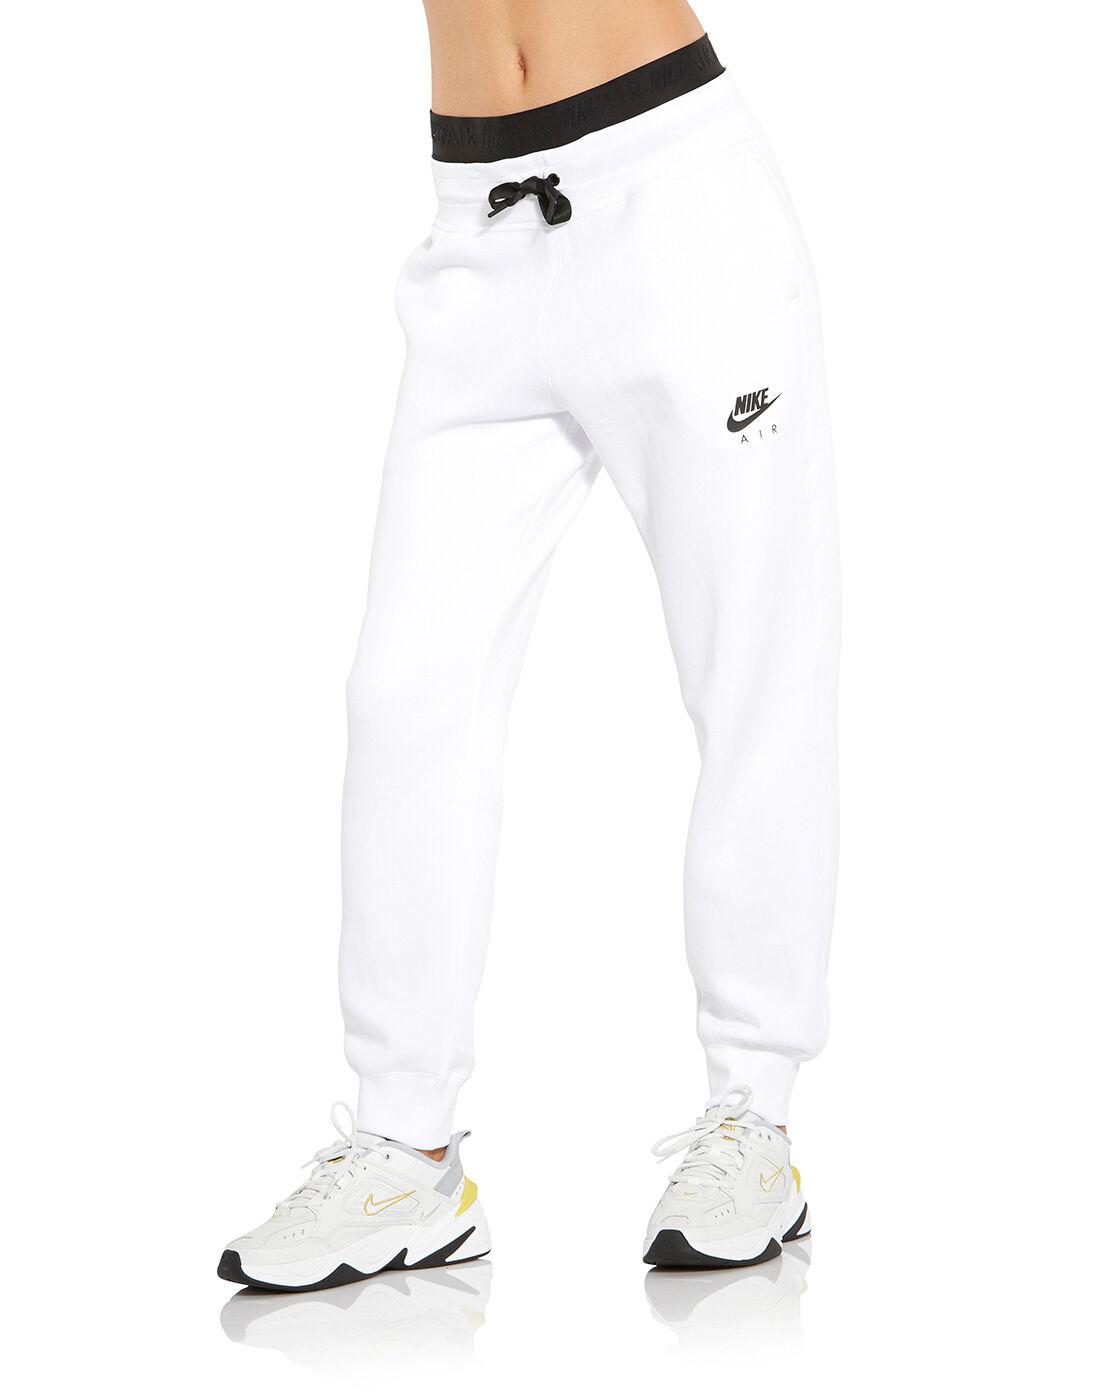 Women's White Nike Air Fleece Pants